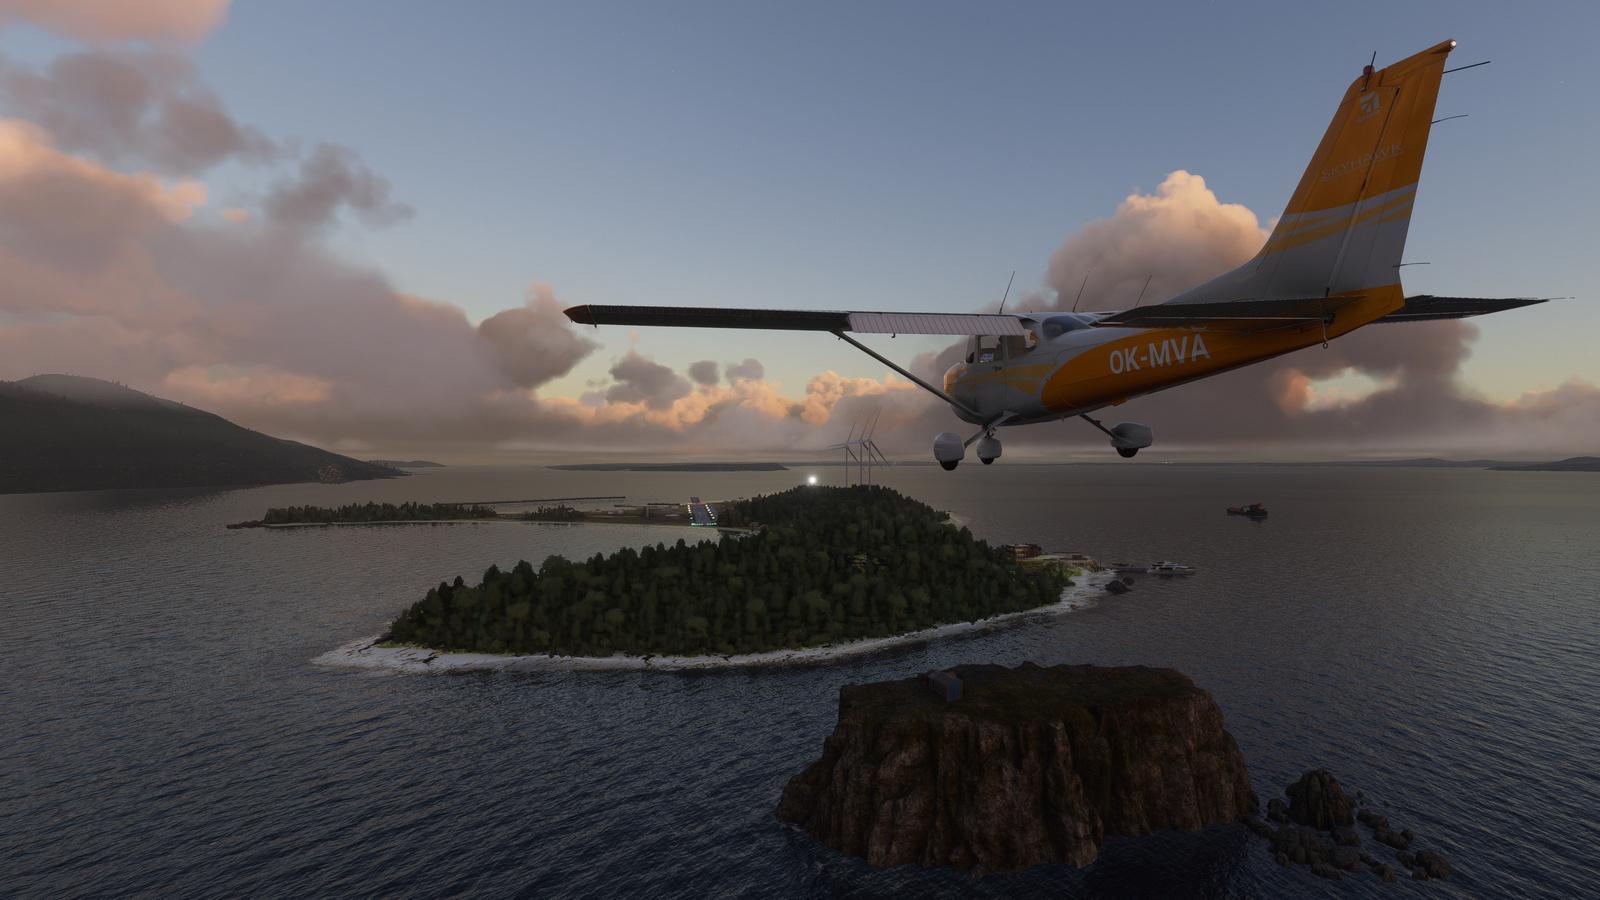 Mouseviator Private Island scenery for Microsoft Flight Simulator